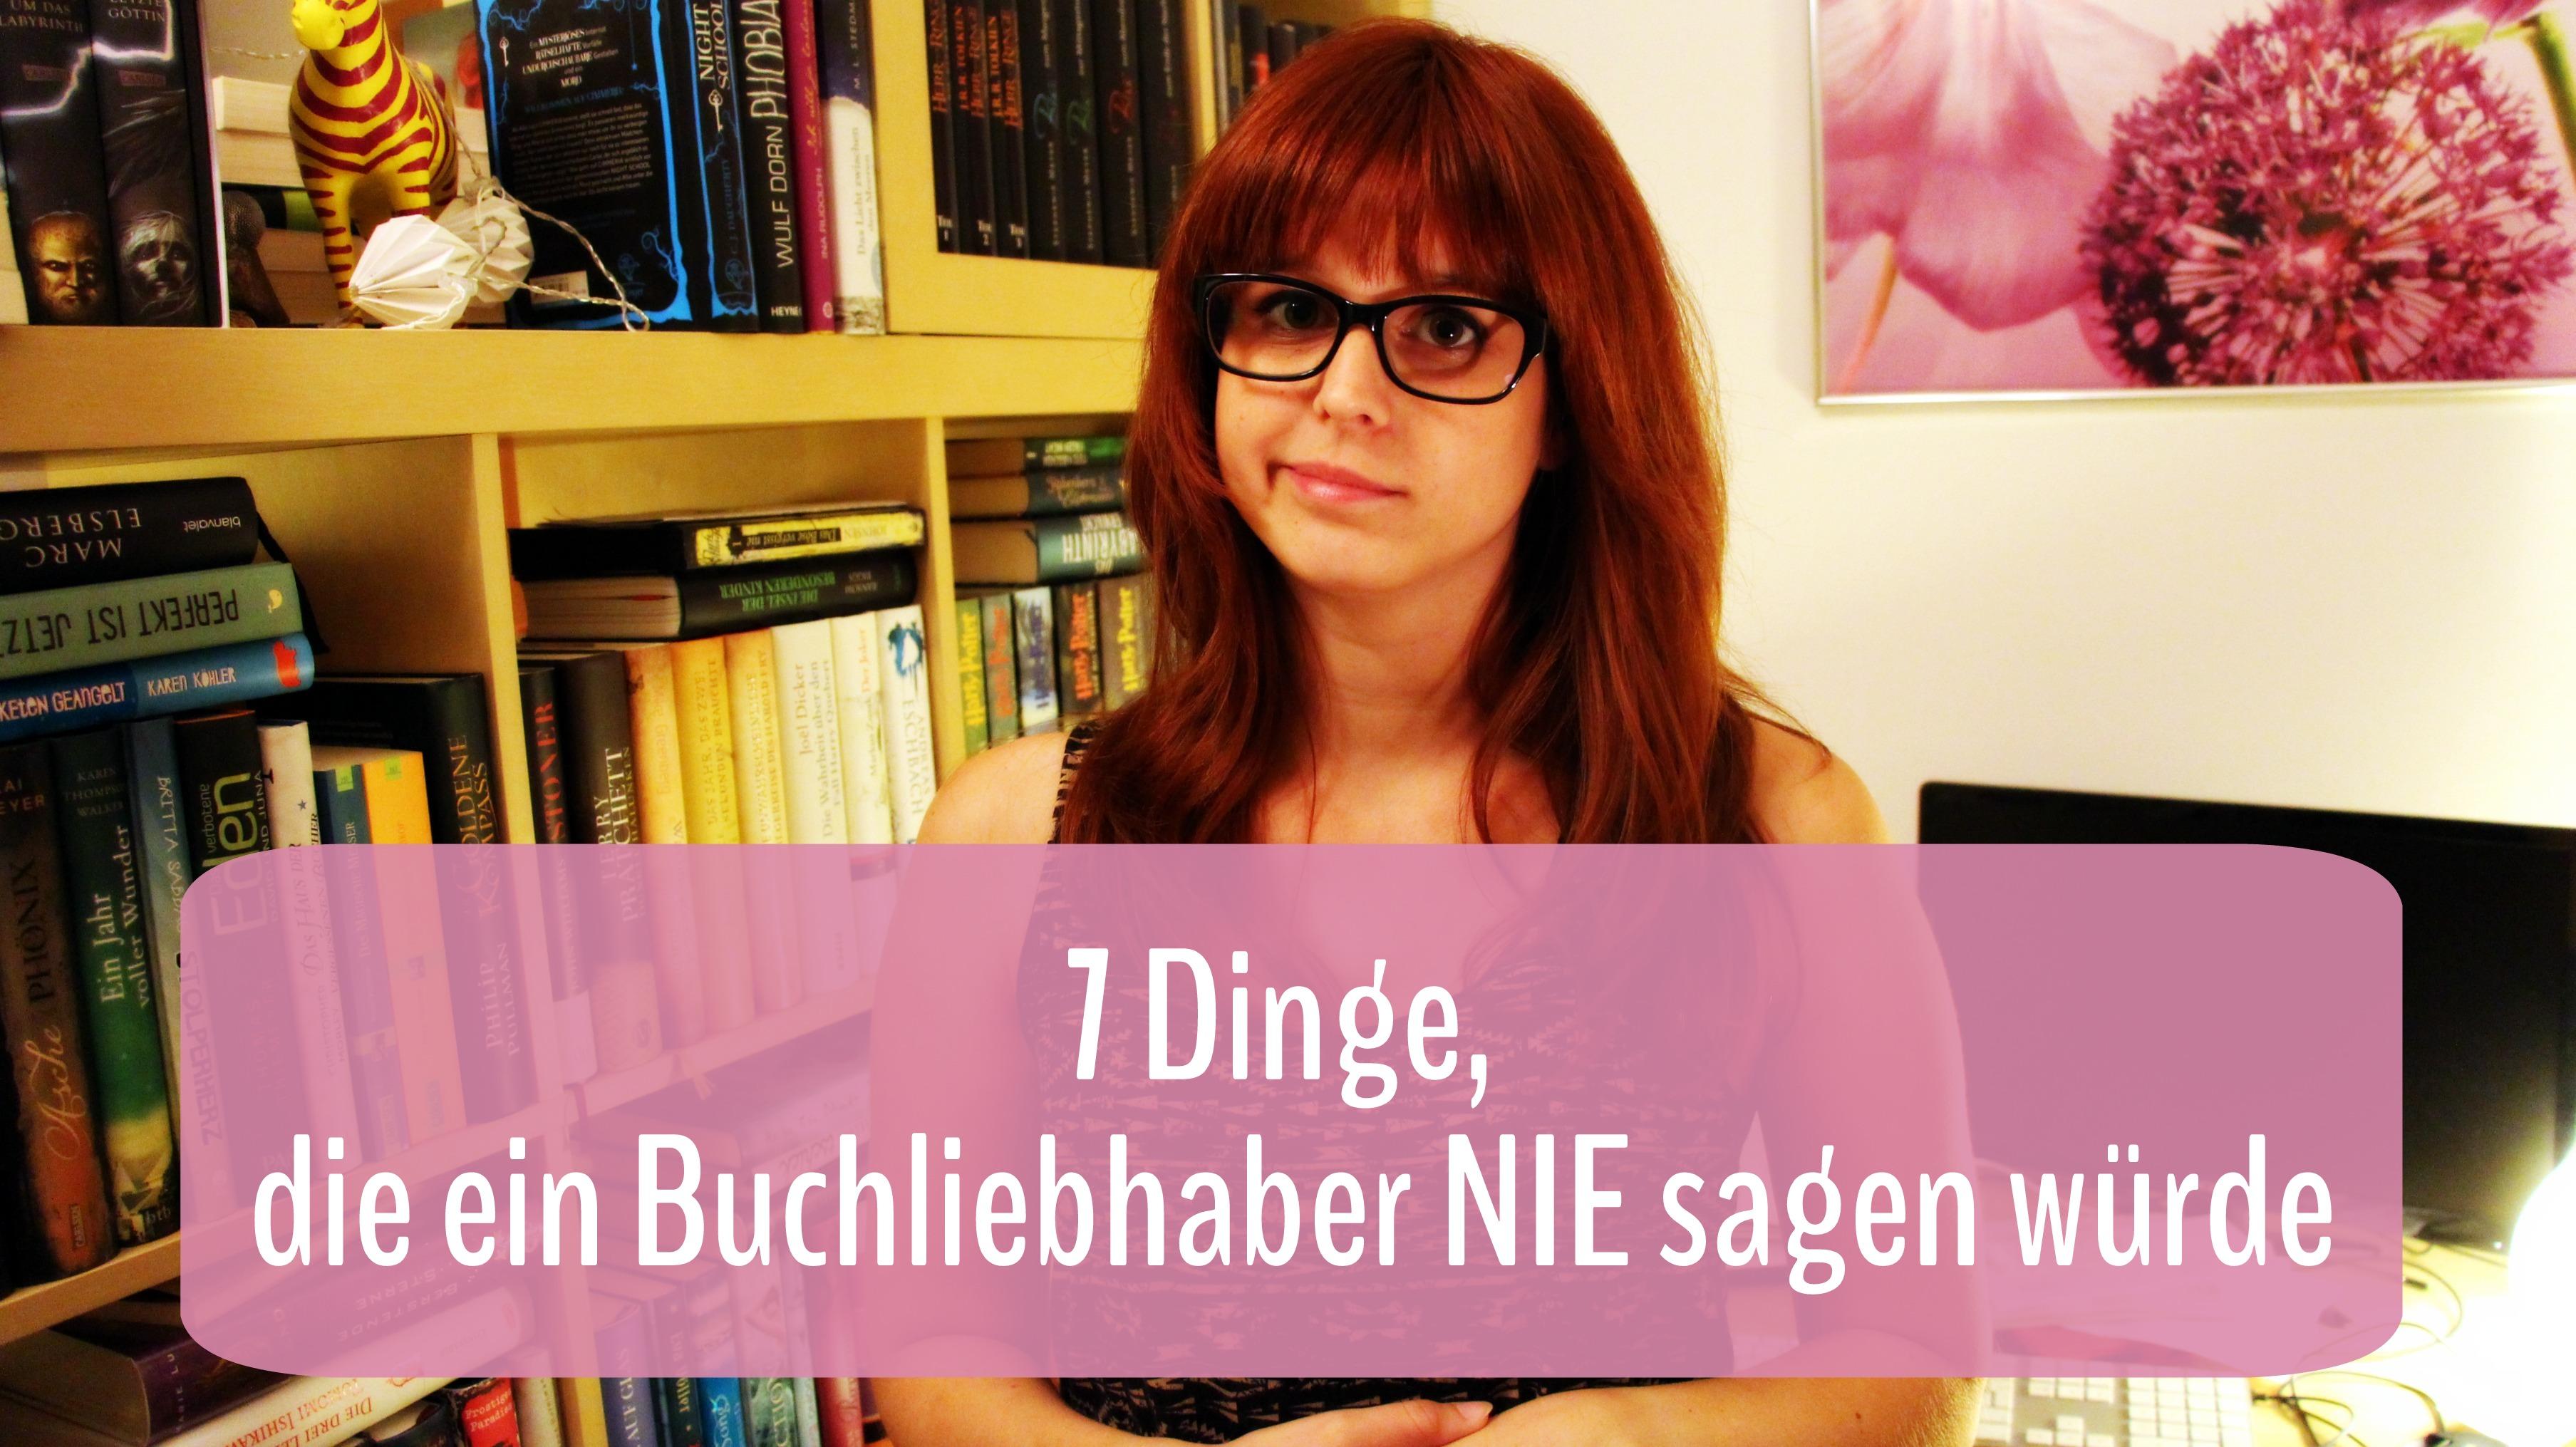 Thumbnail_Video_Buchliebhaber